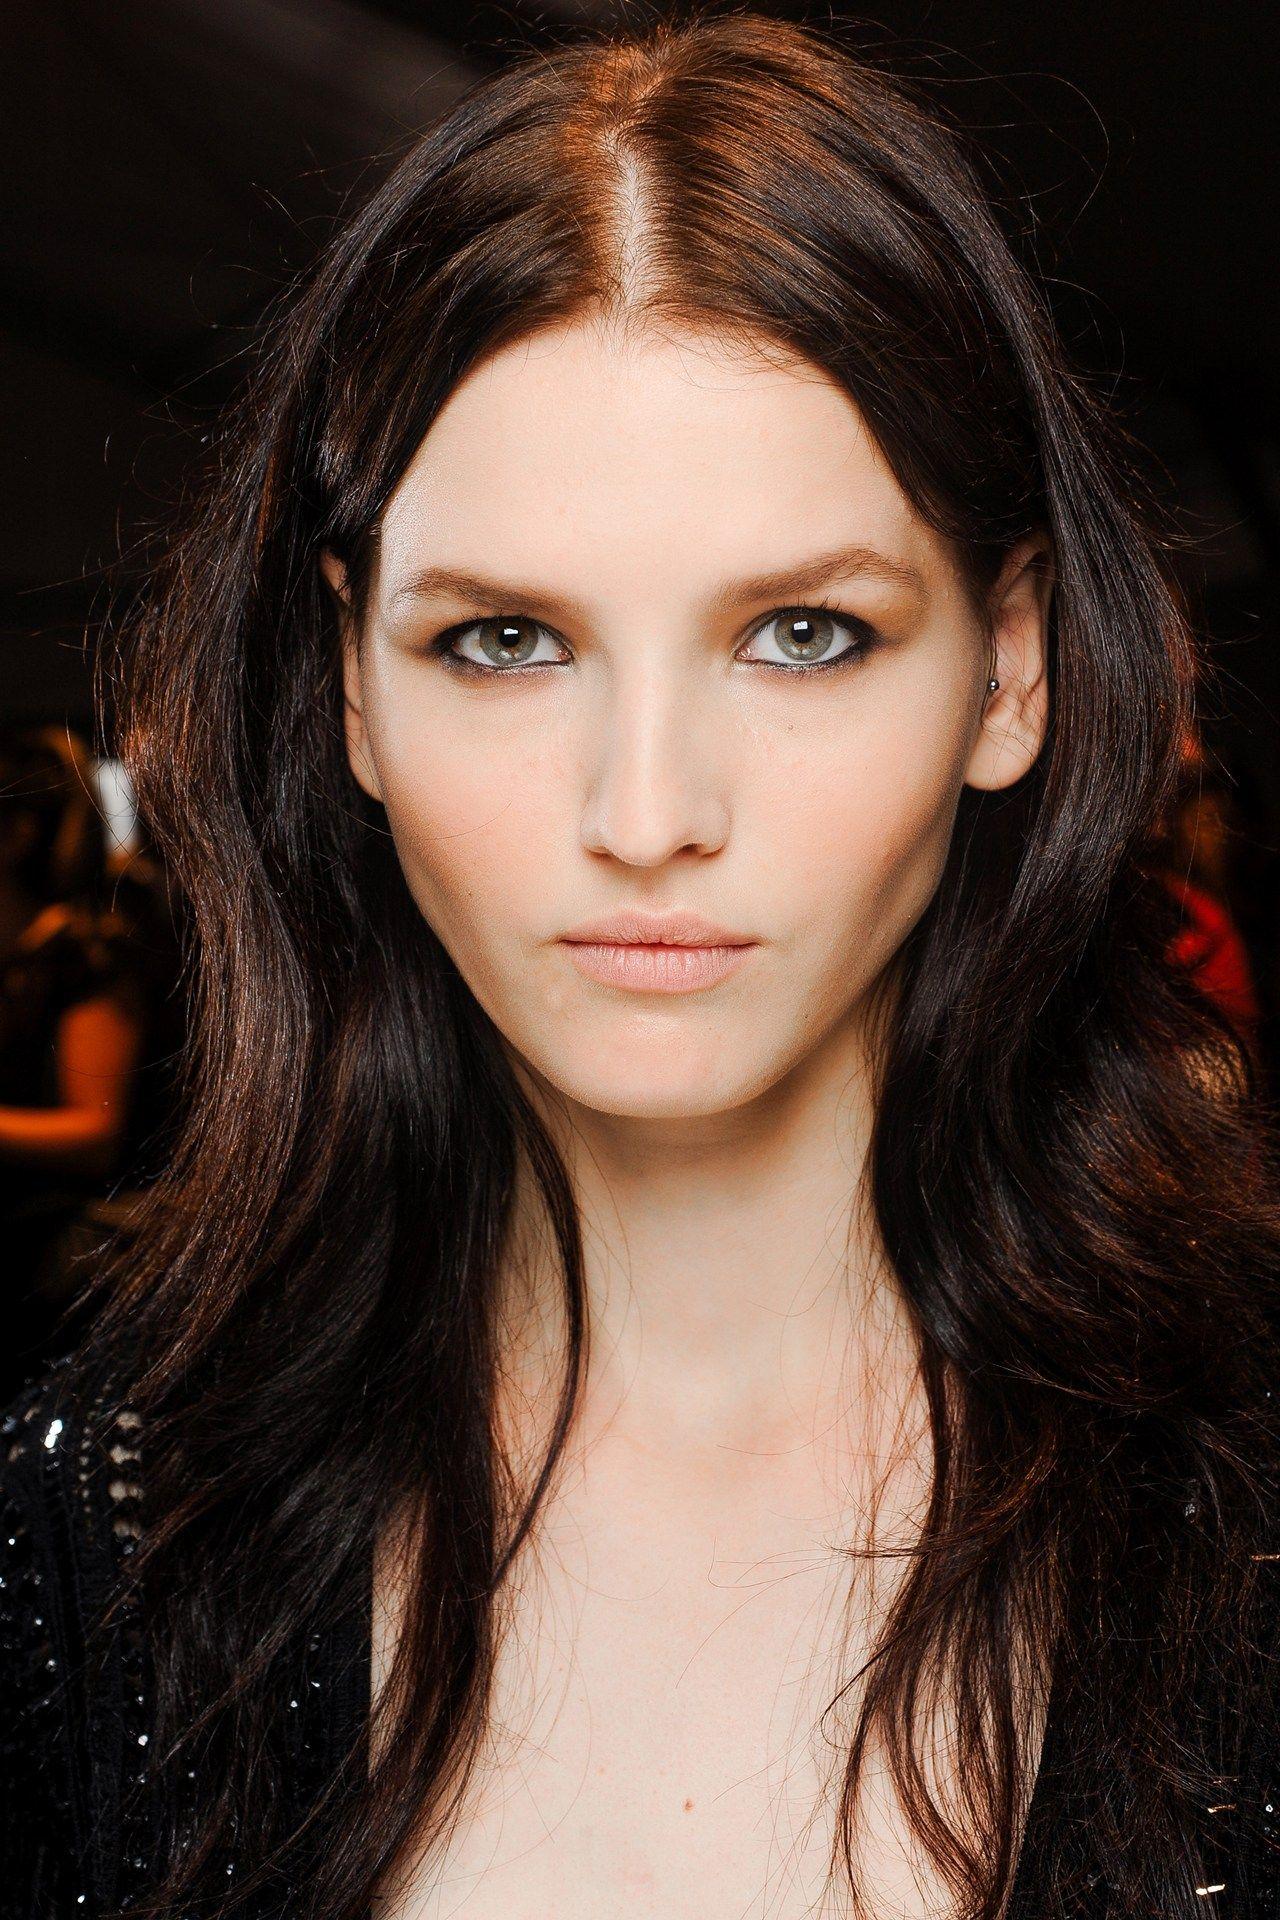 Alyssa Ruland katlin aas - roberto cavalli backstage | beauty beat